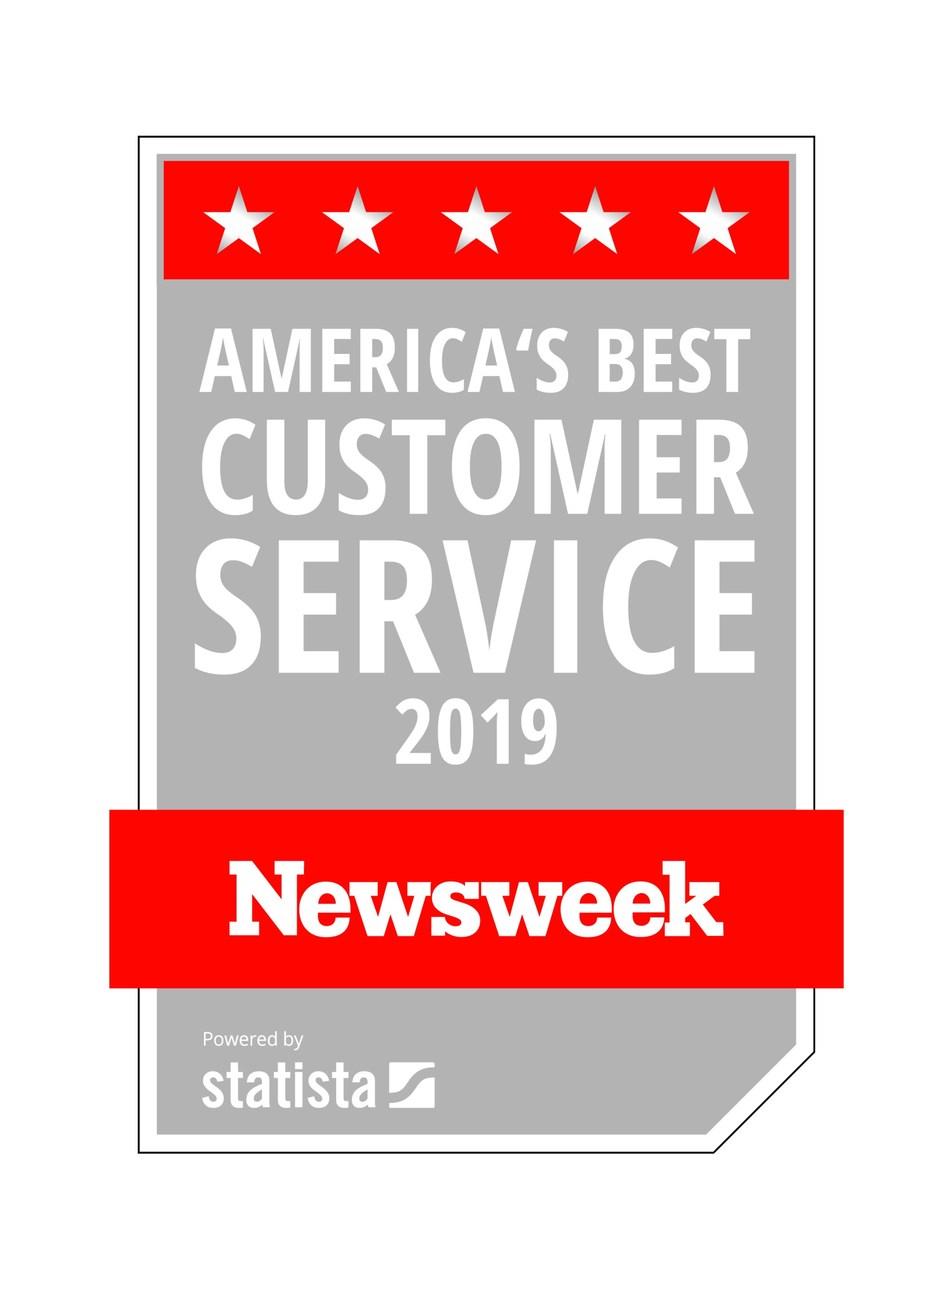 Lighting New York Awarded with America's Best Customer Service 2019 Award by Newsweek.